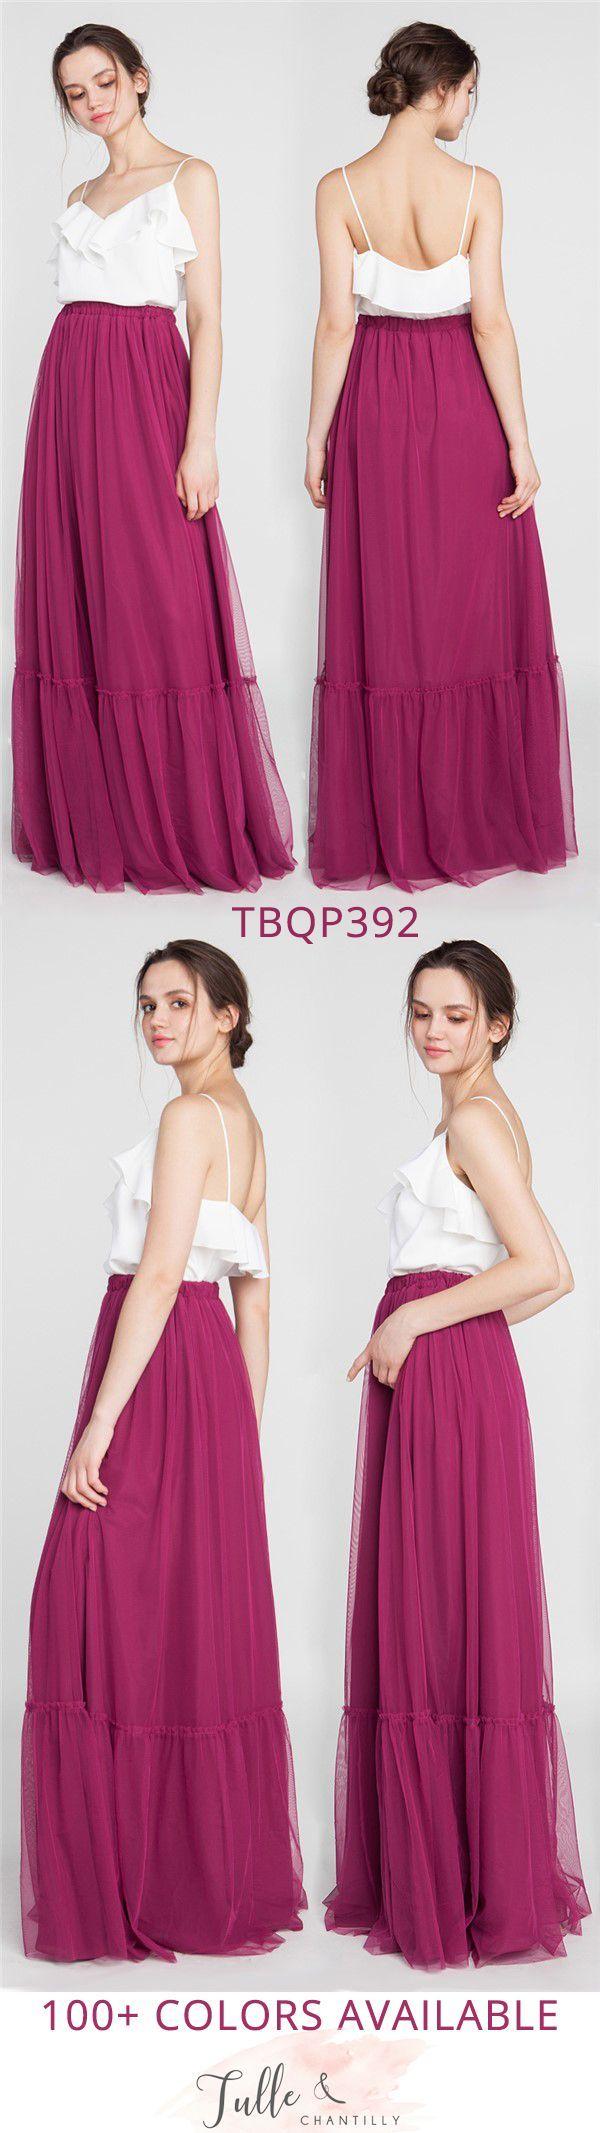 The 32 best Purple Bridesmaid Dresses images on Pinterest ...